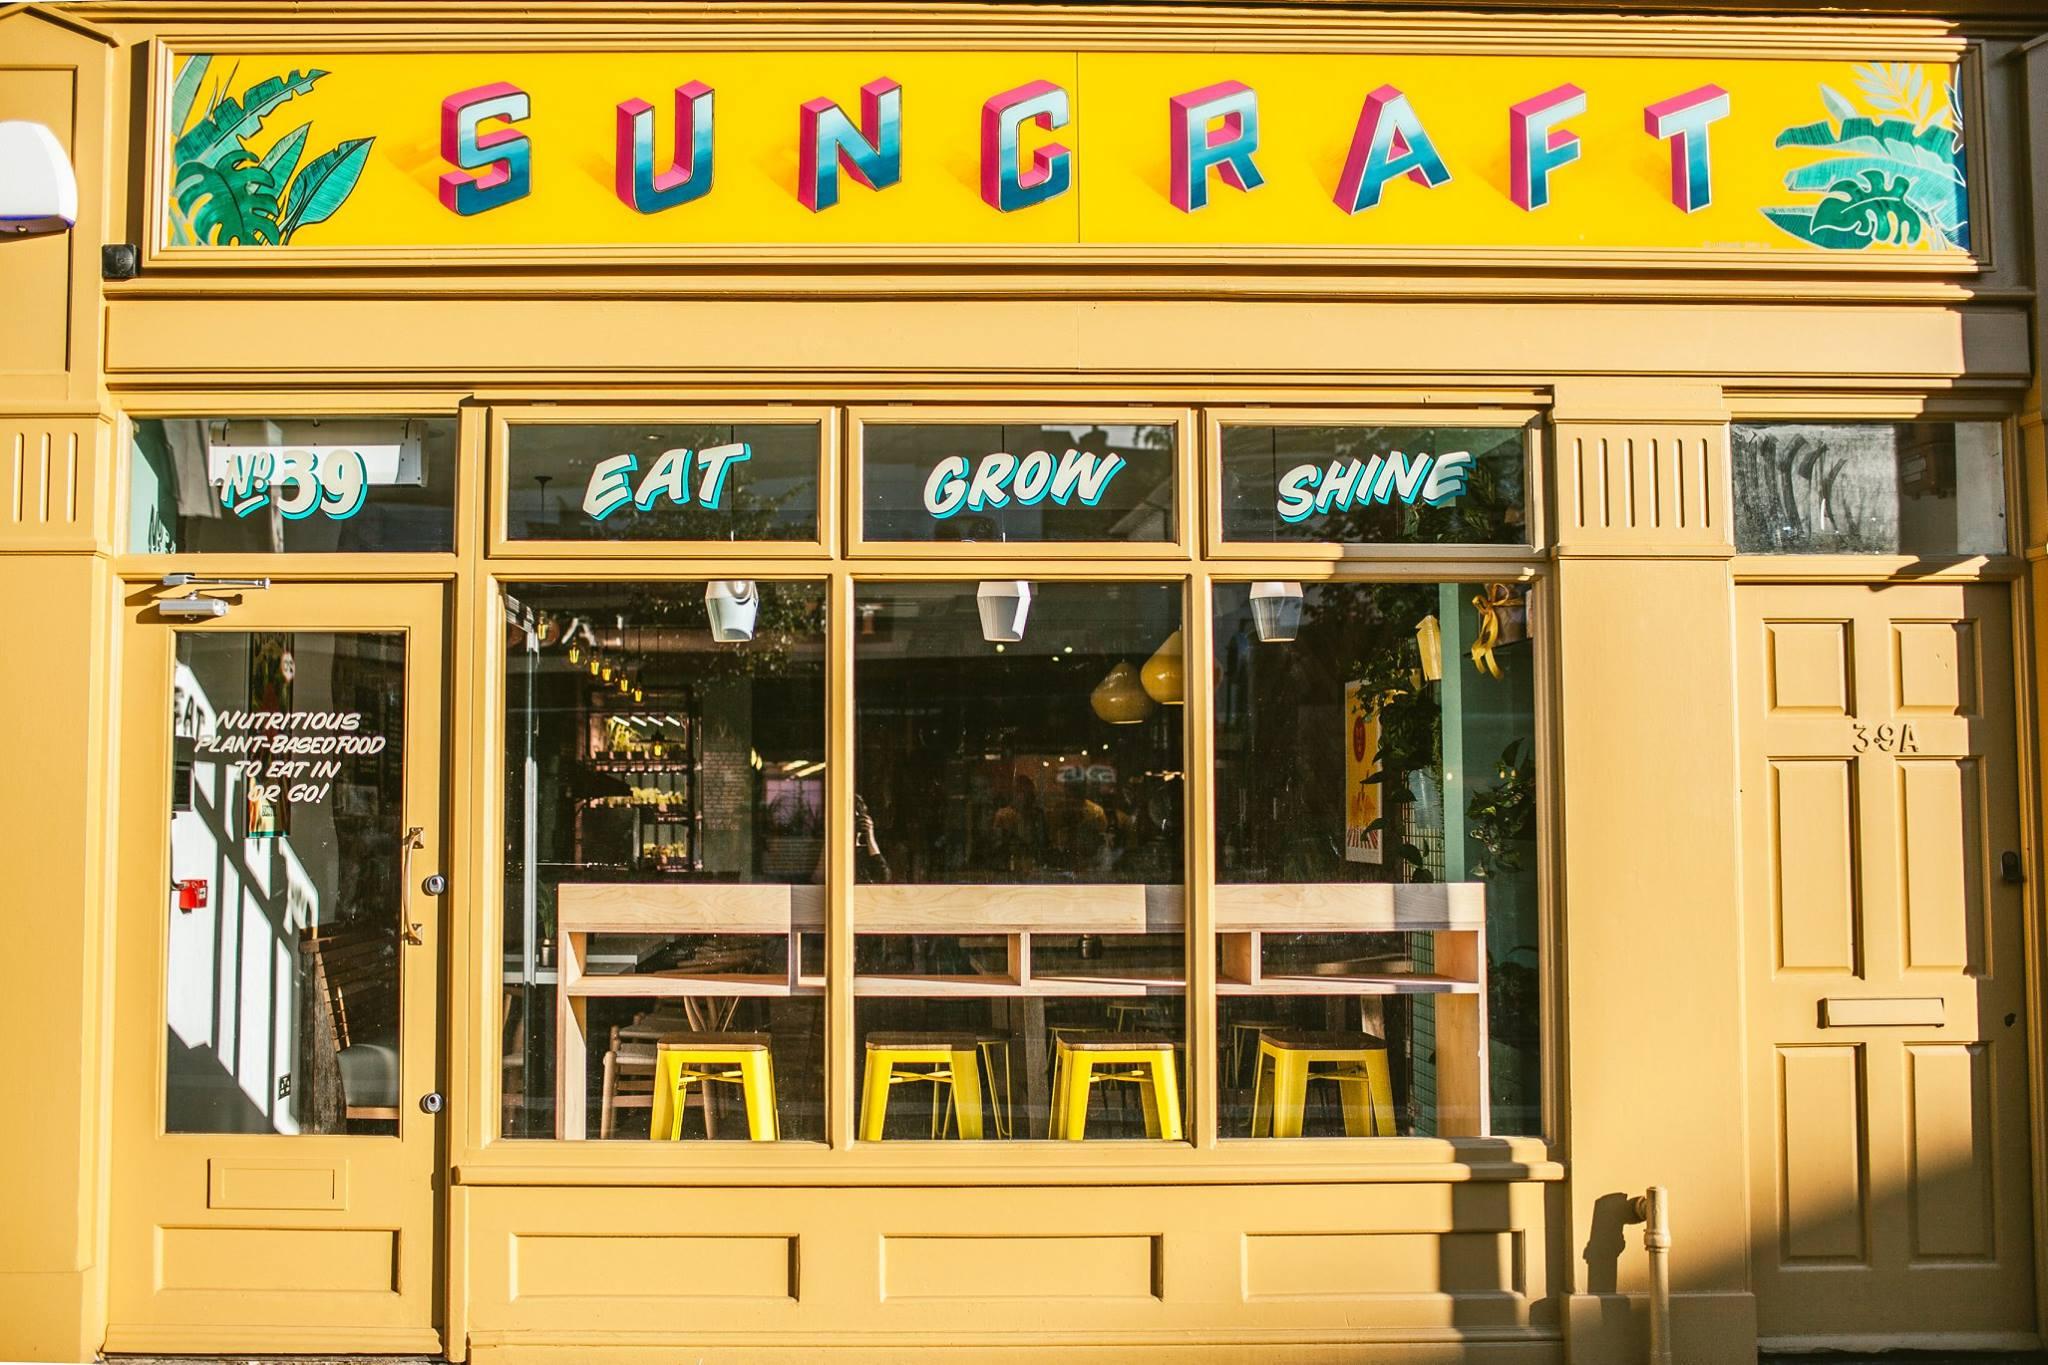 suncraft bristol